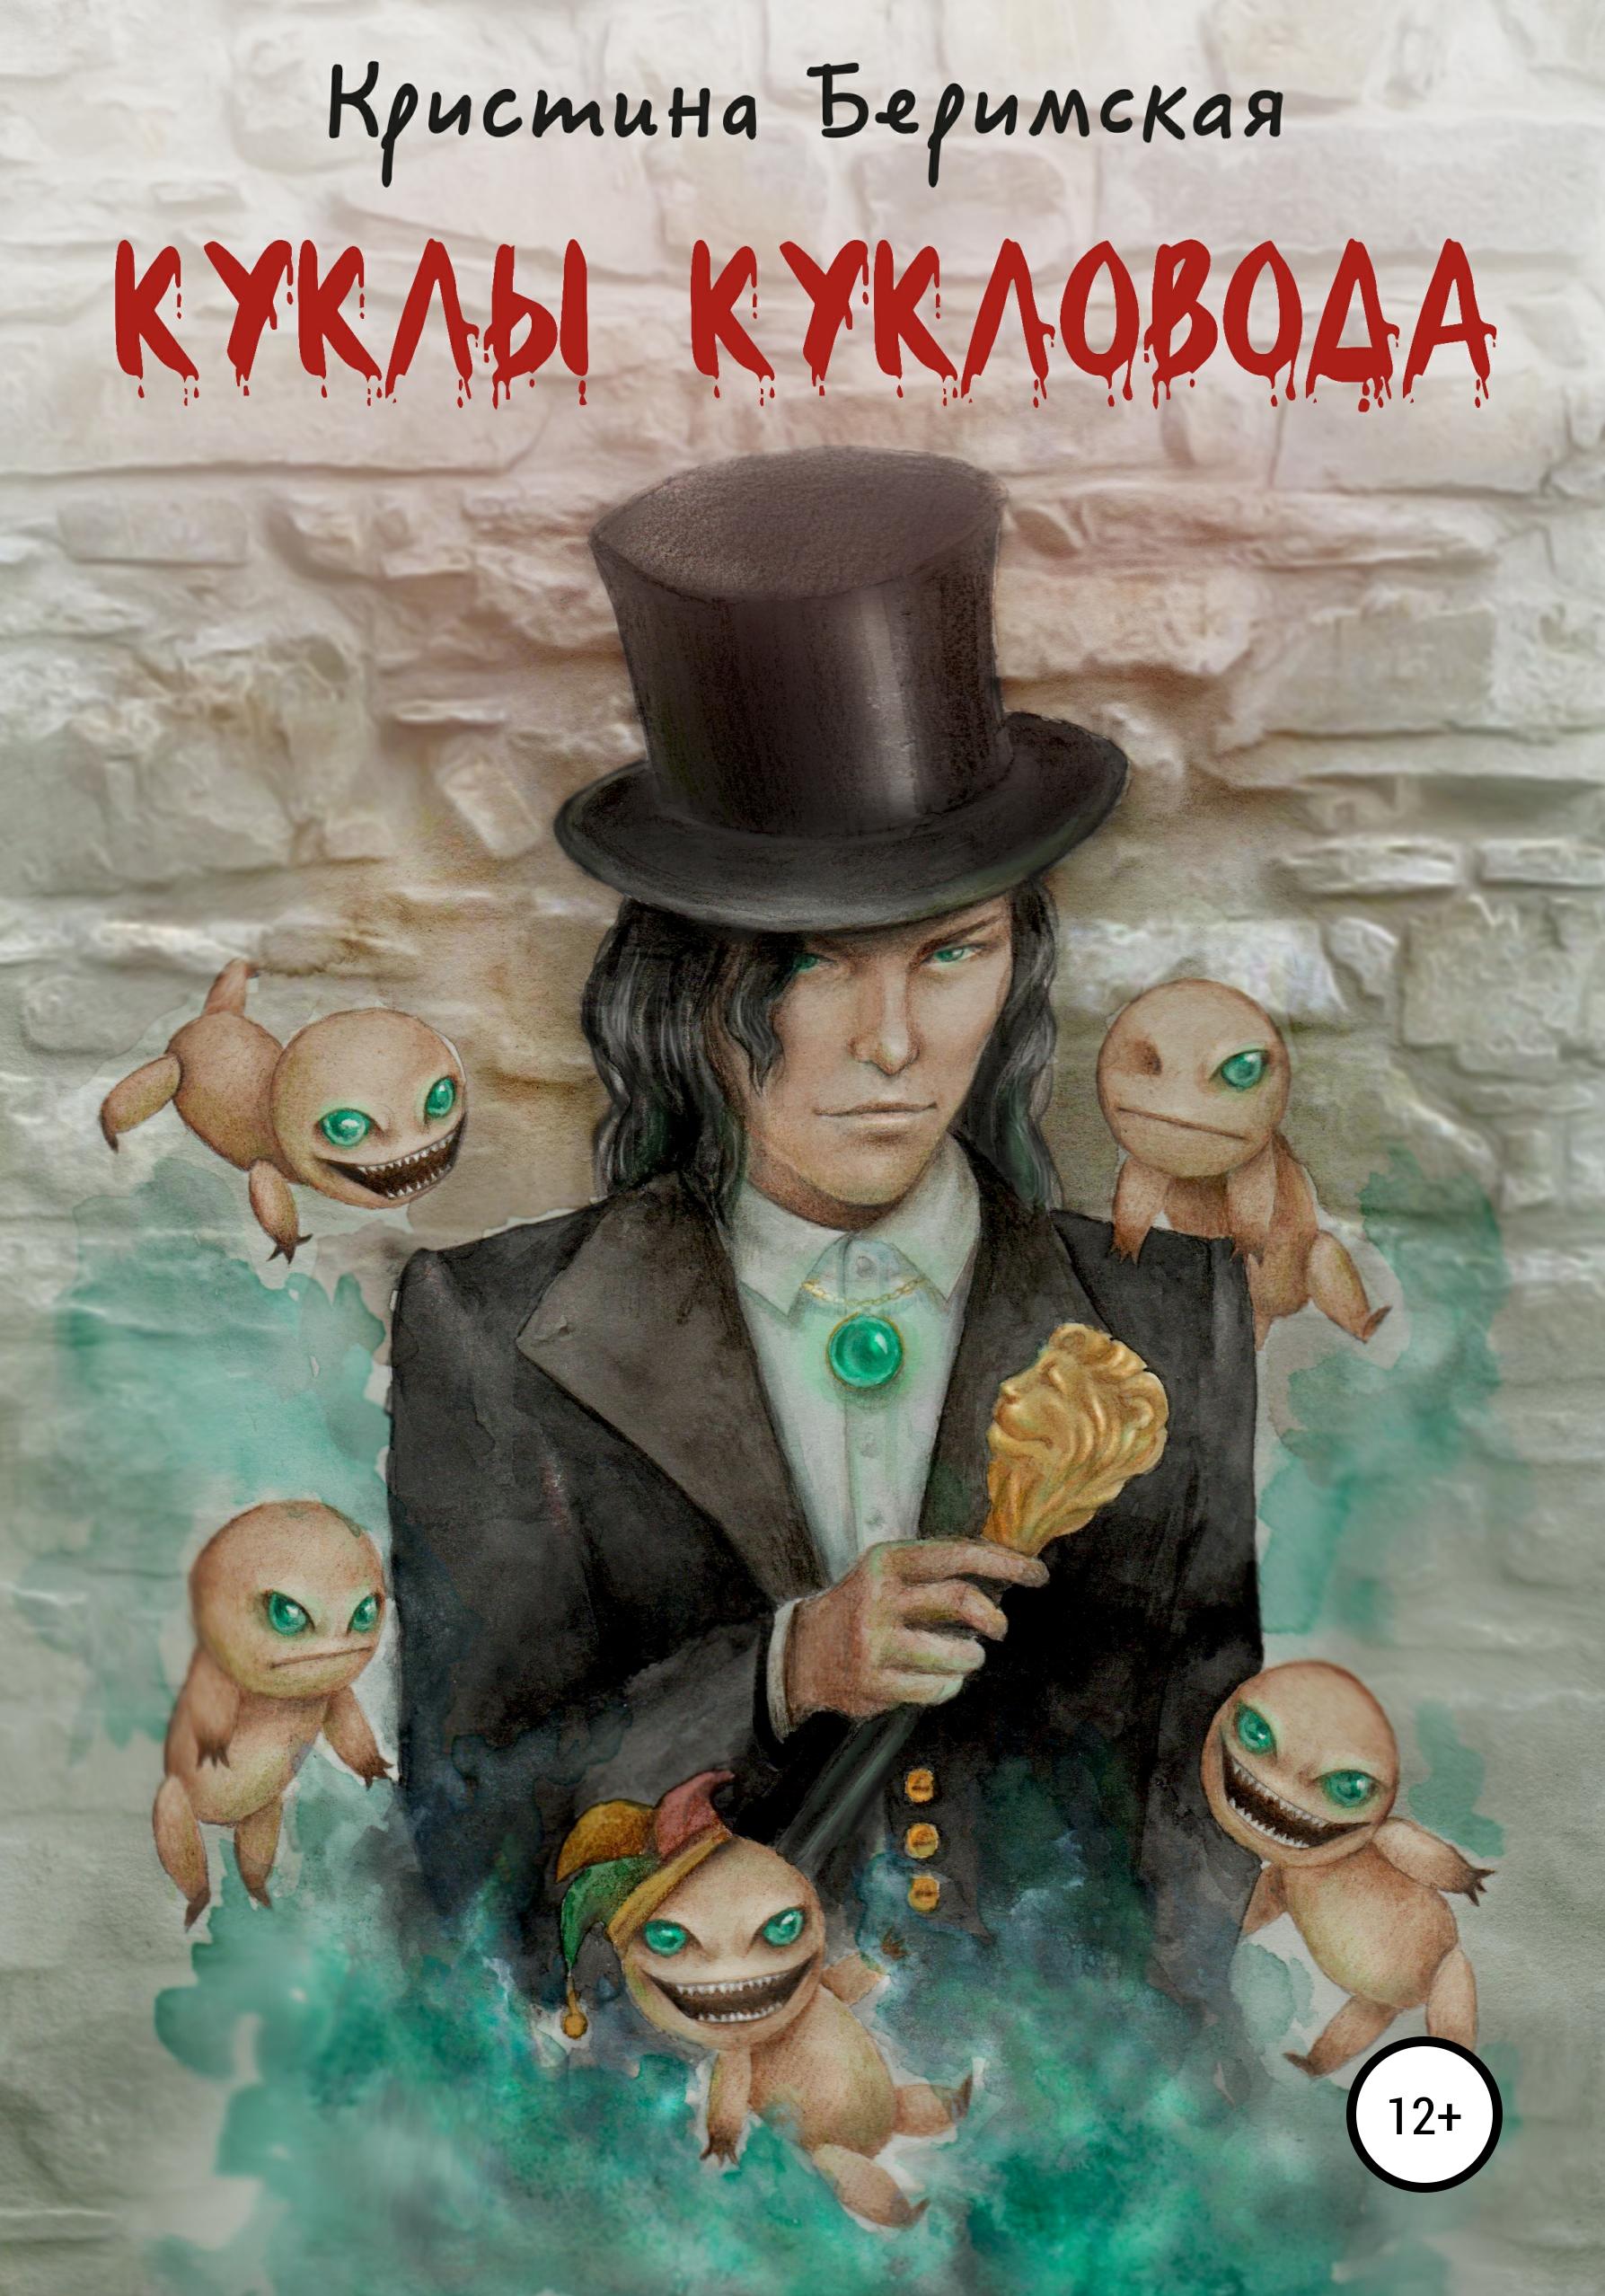 Купить книгу Куклы кукловода, автора Кристины Беримской